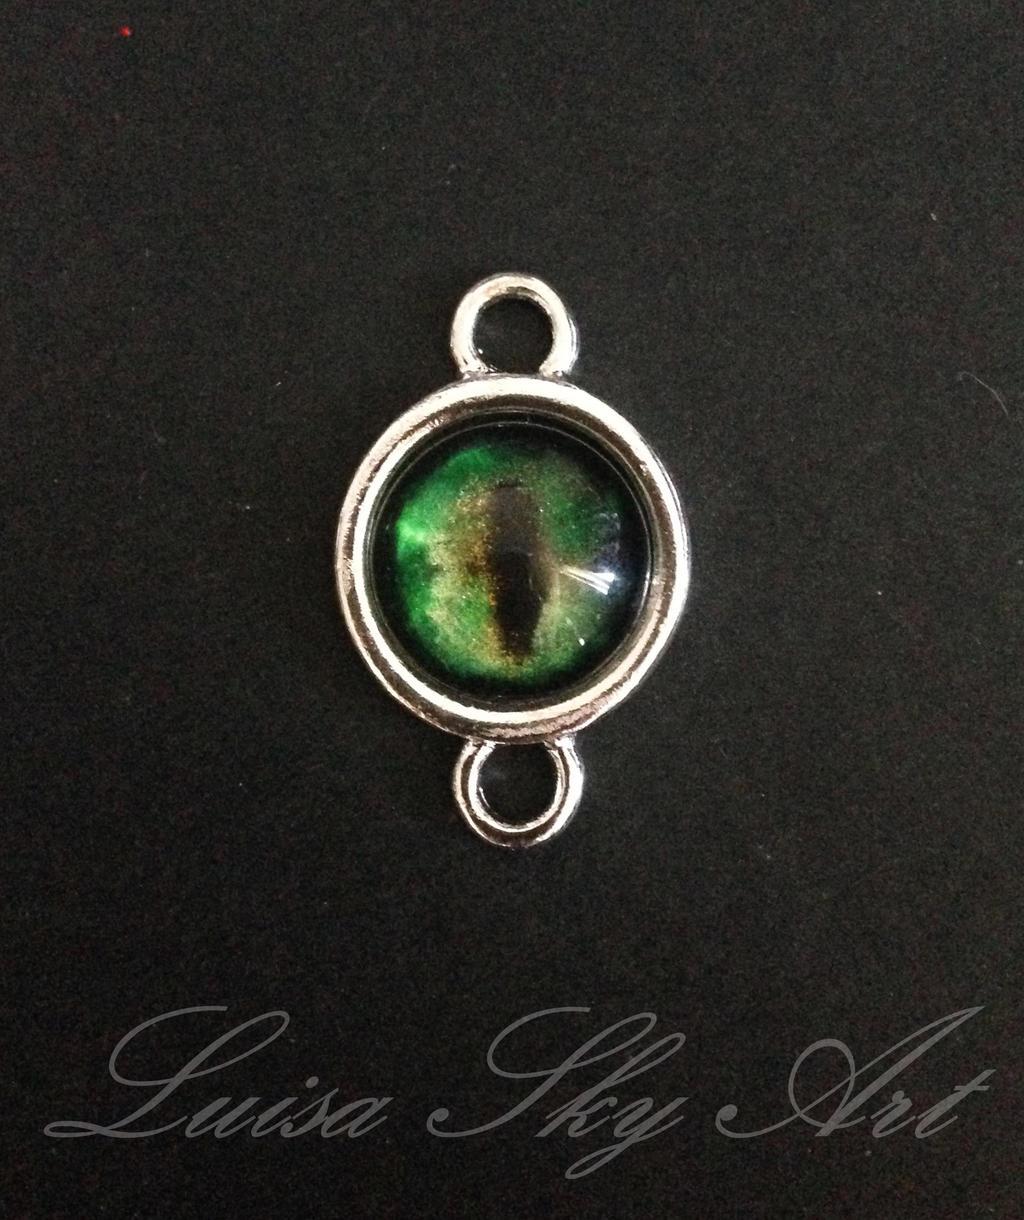 handgemachter schmuck green cat eye by luisasky on deviantart. Black Bedroom Furniture Sets. Home Design Ideas